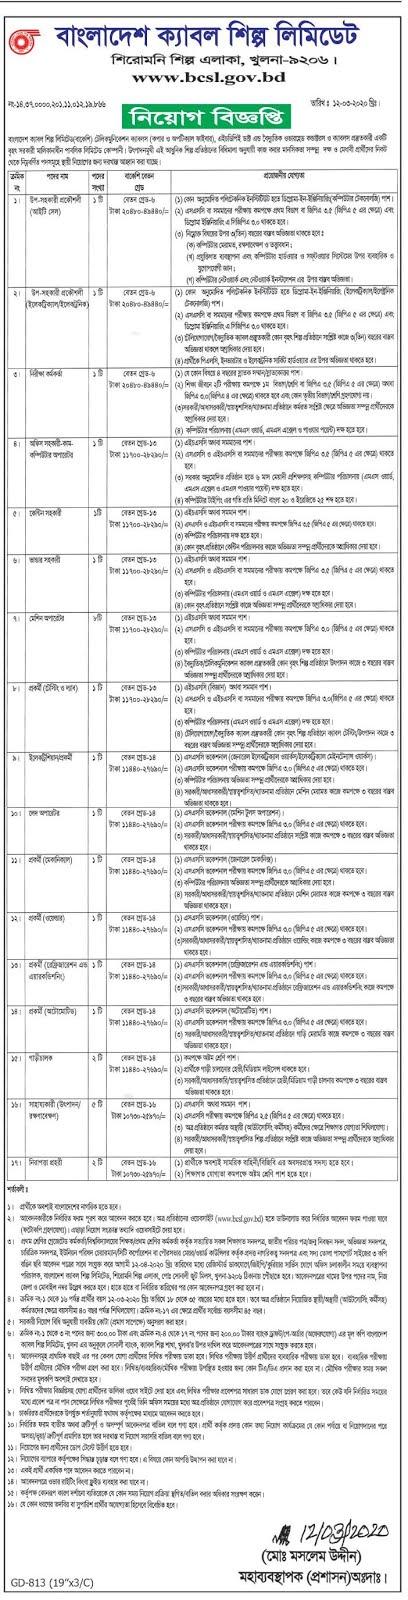 Bangladesh Cable Shilpa Limited Job Circular 2020